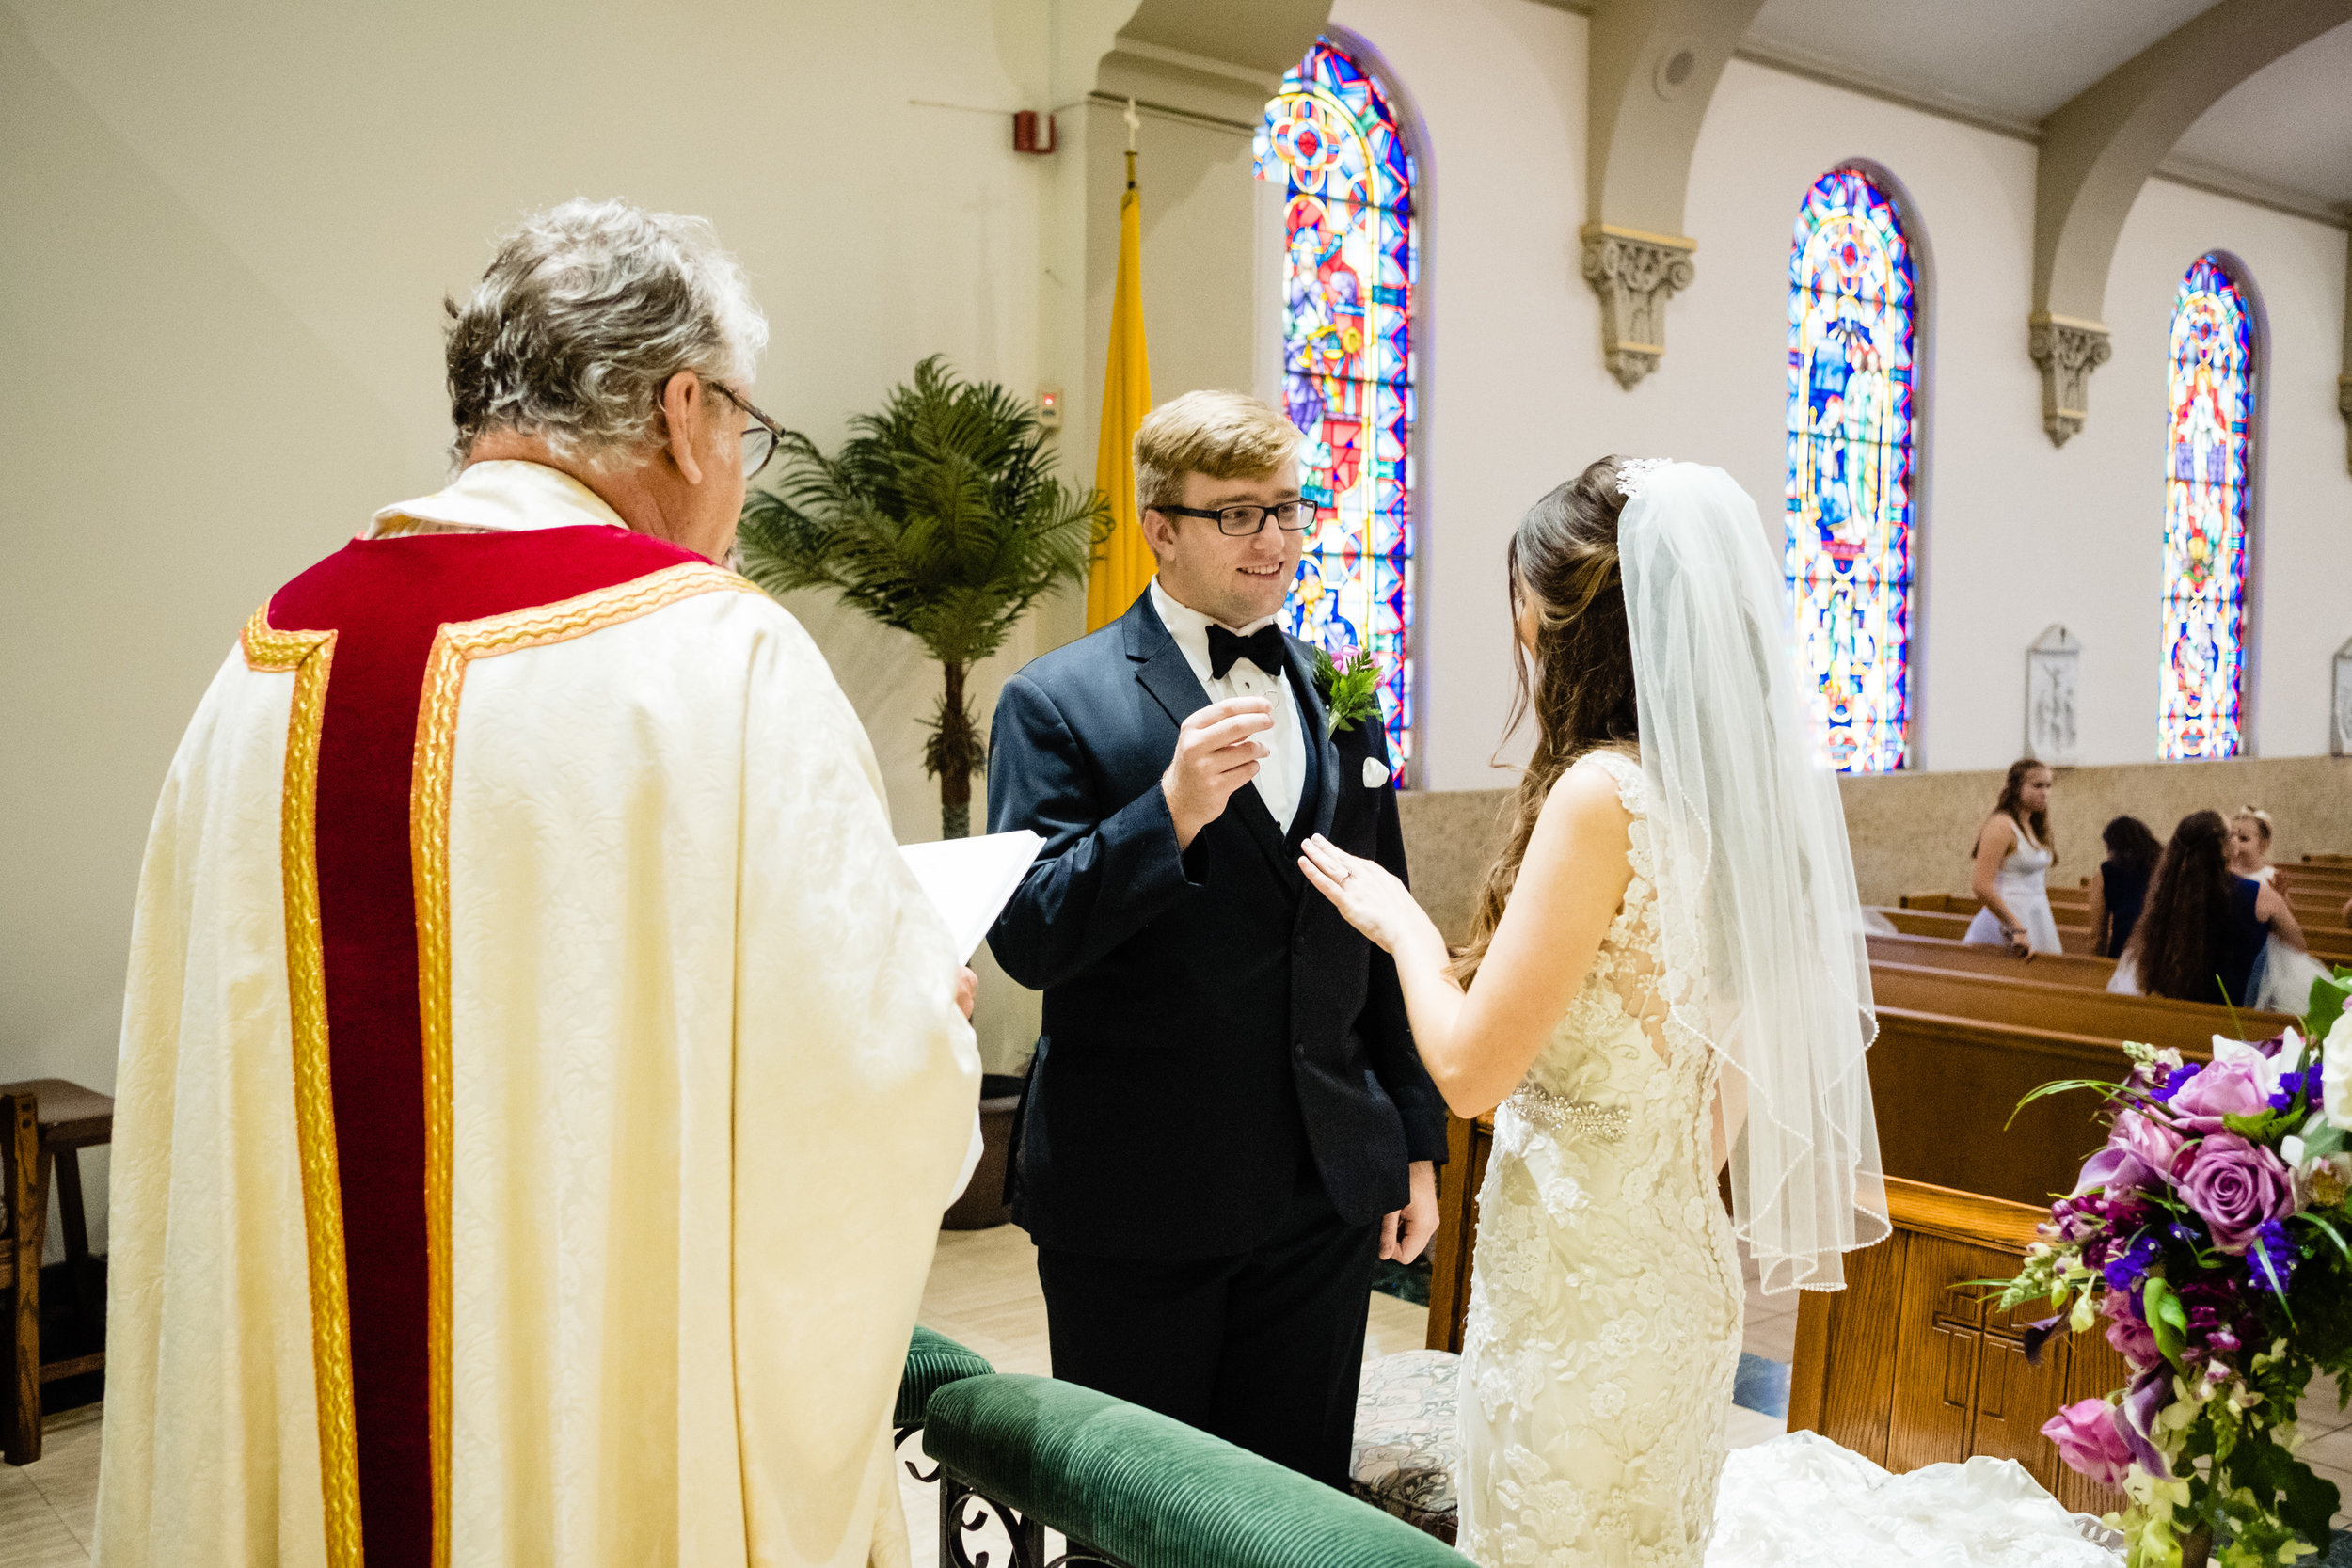 HAH_Zoe and Daniel_Clearwater Wedding_231_2018.jpg